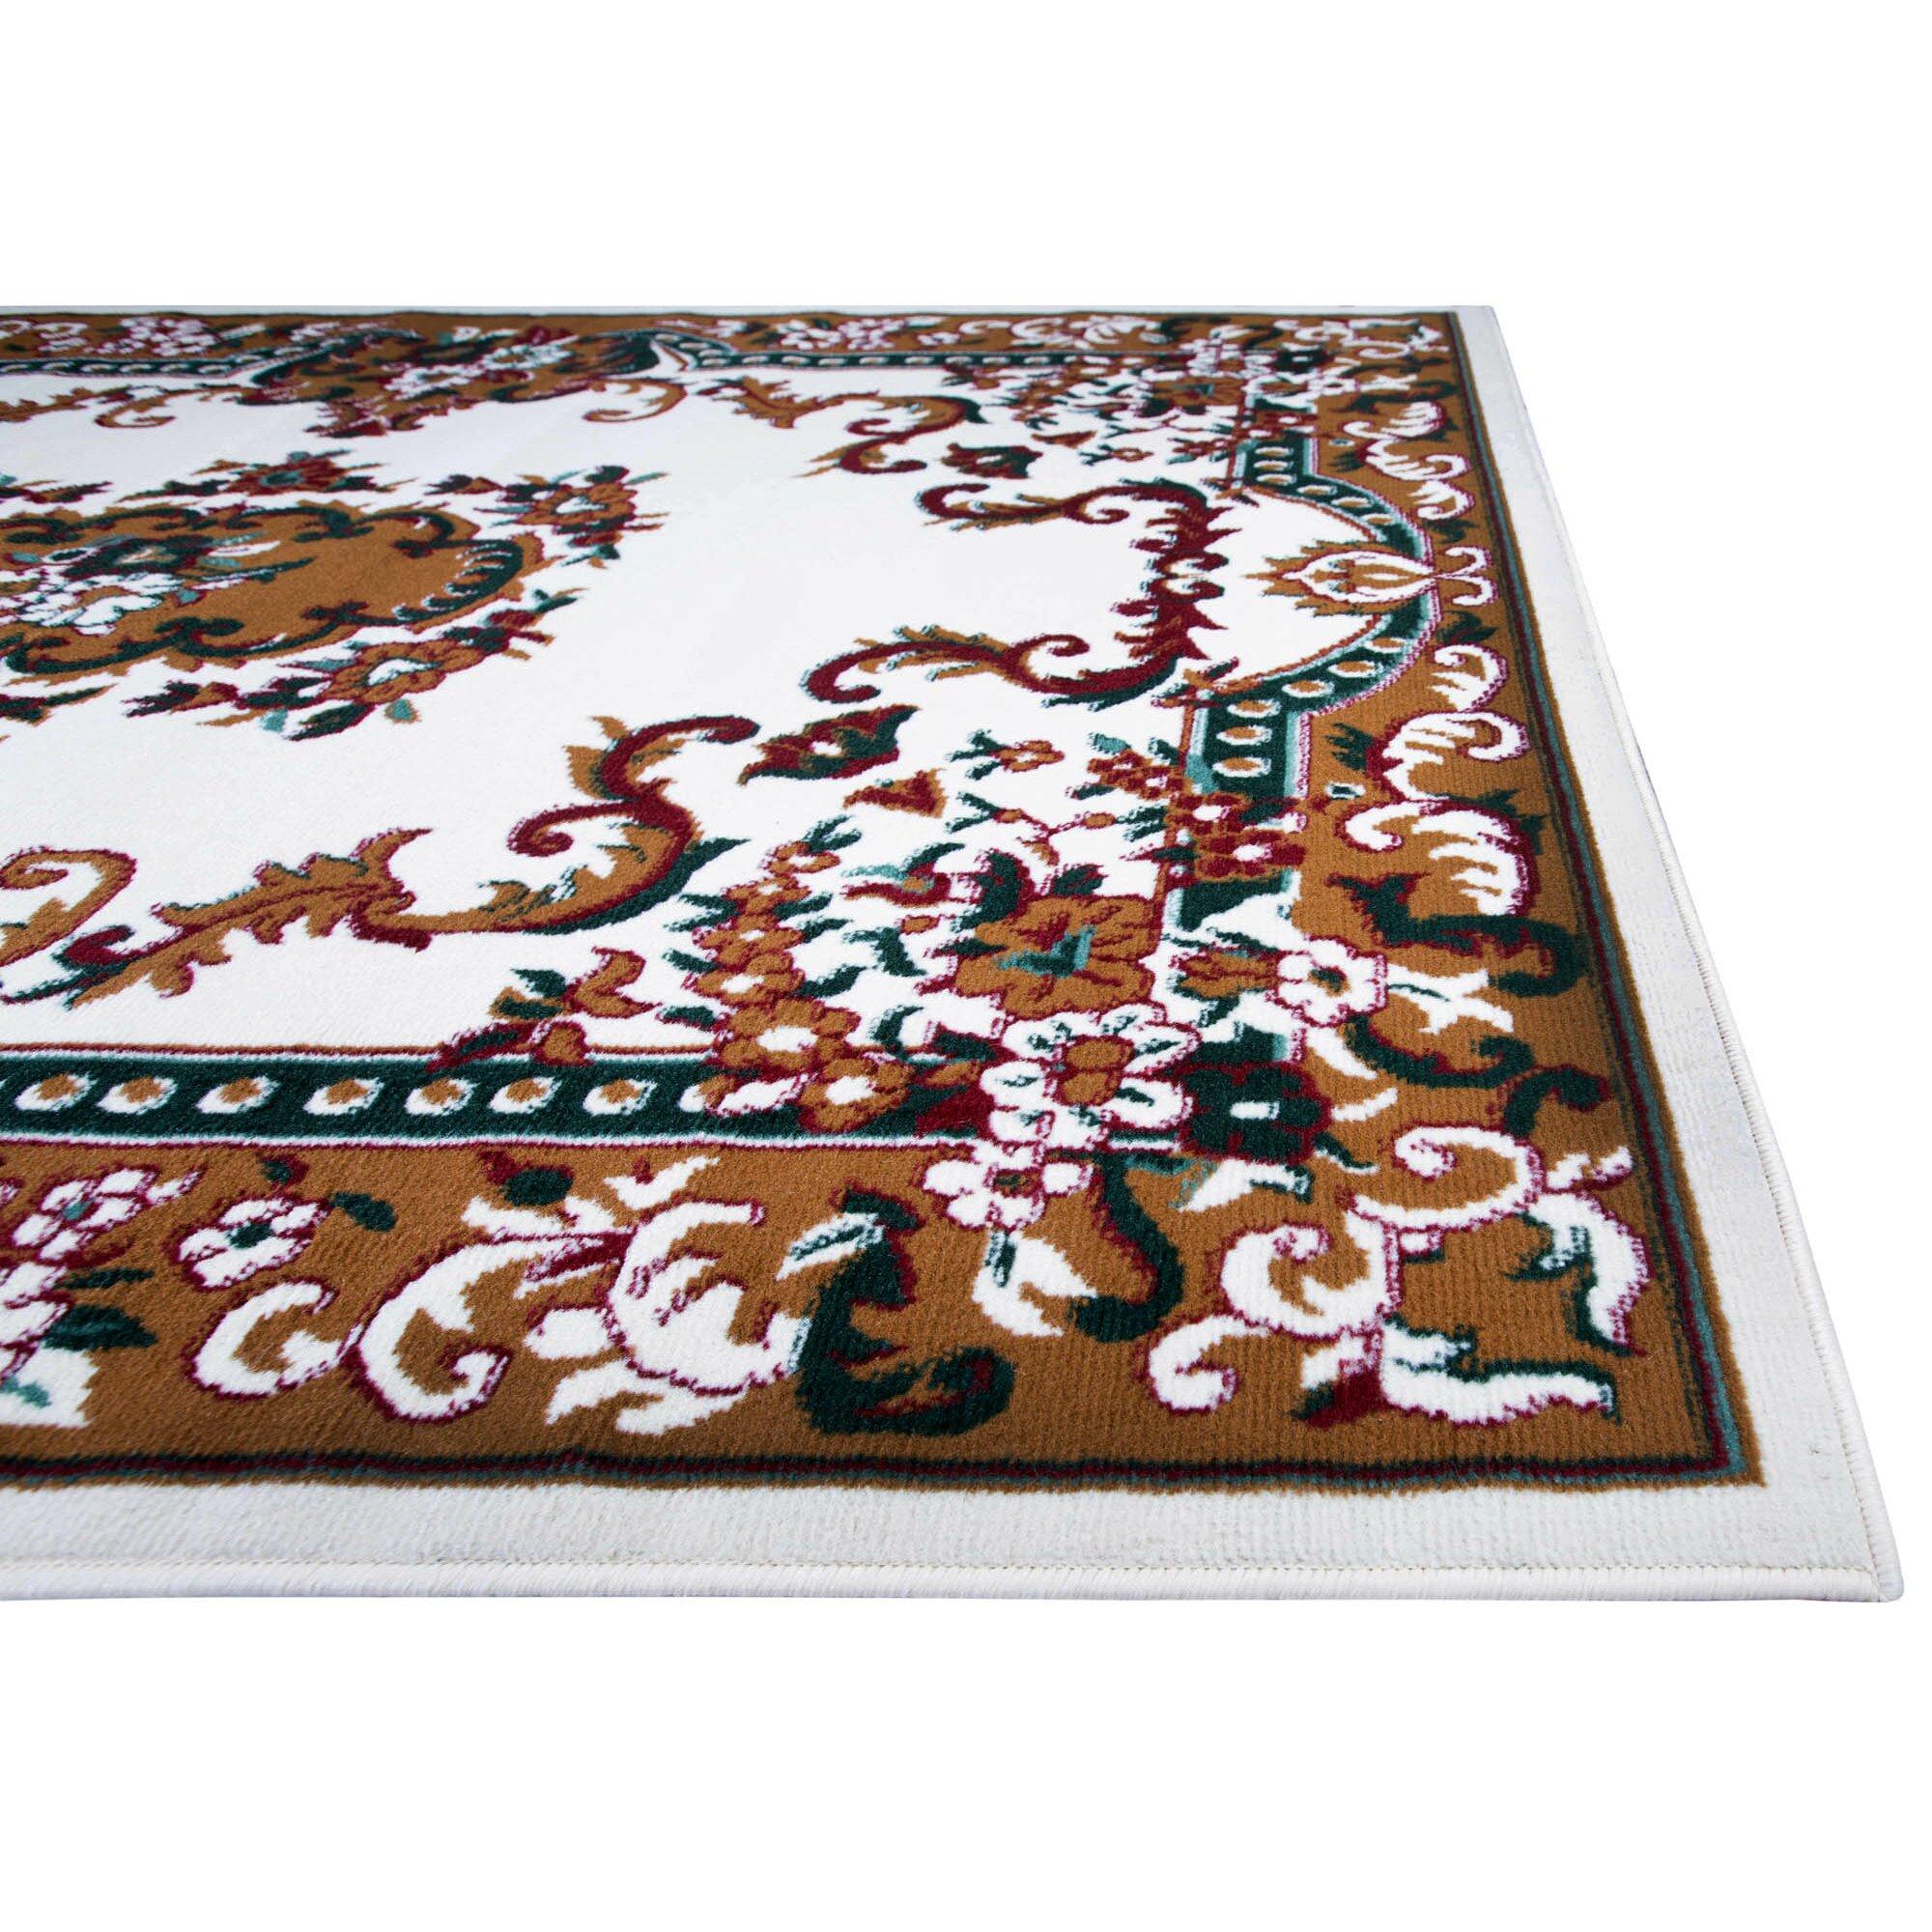 8x10 Area Rugs Wayfair: Home Dynamix Premium Beige Area Rug & Reviews